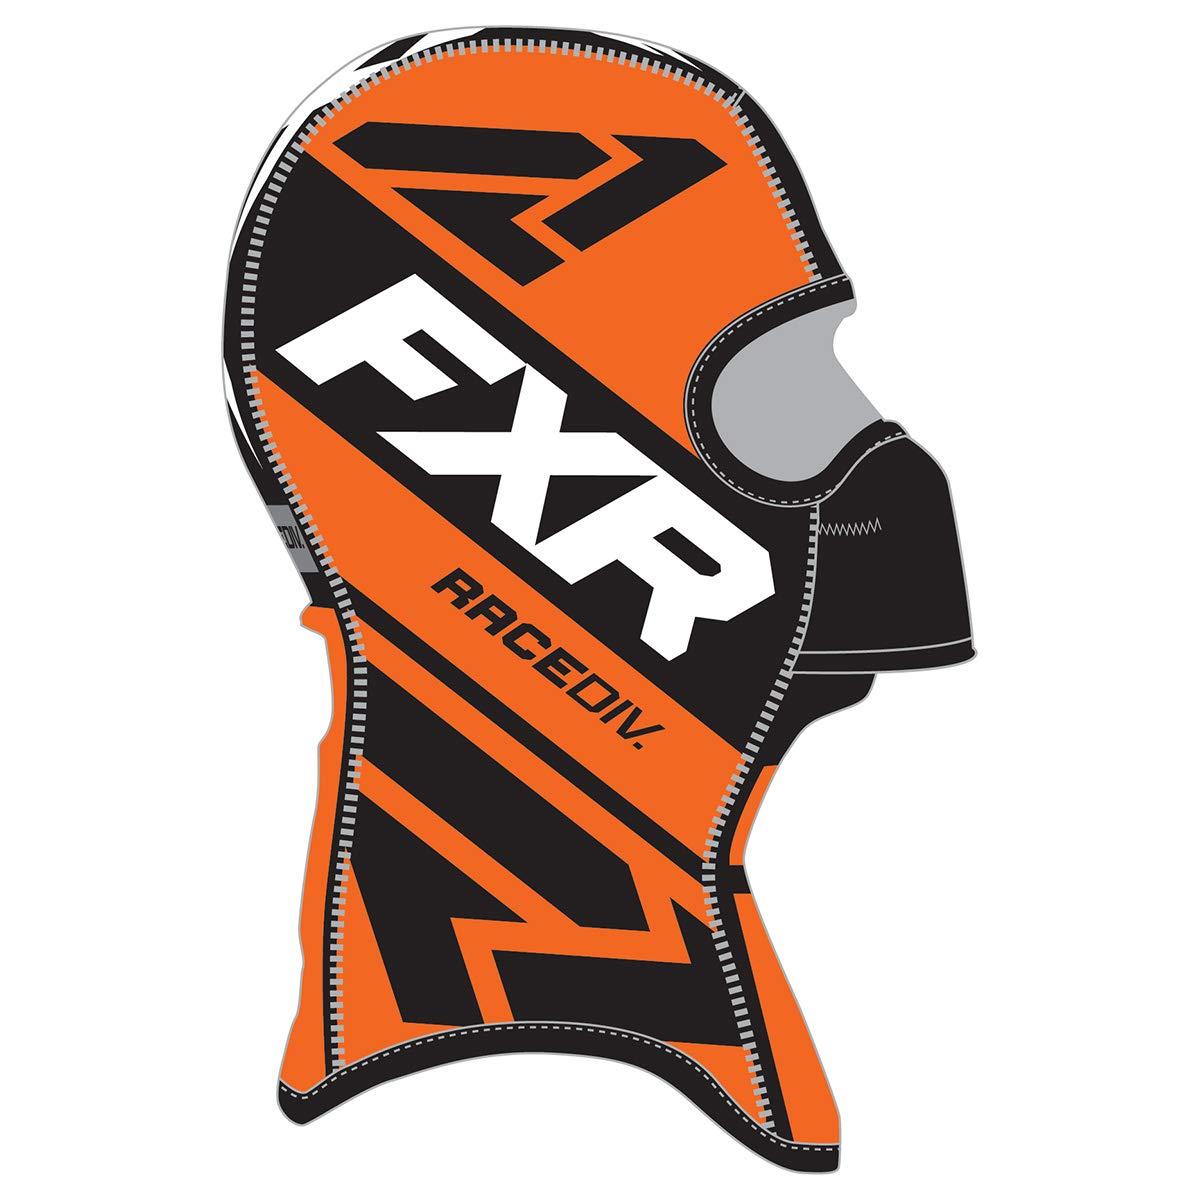 FXR Cold Stop RR Anti-Fog Balaclava Black Ops L 201644-1010-13